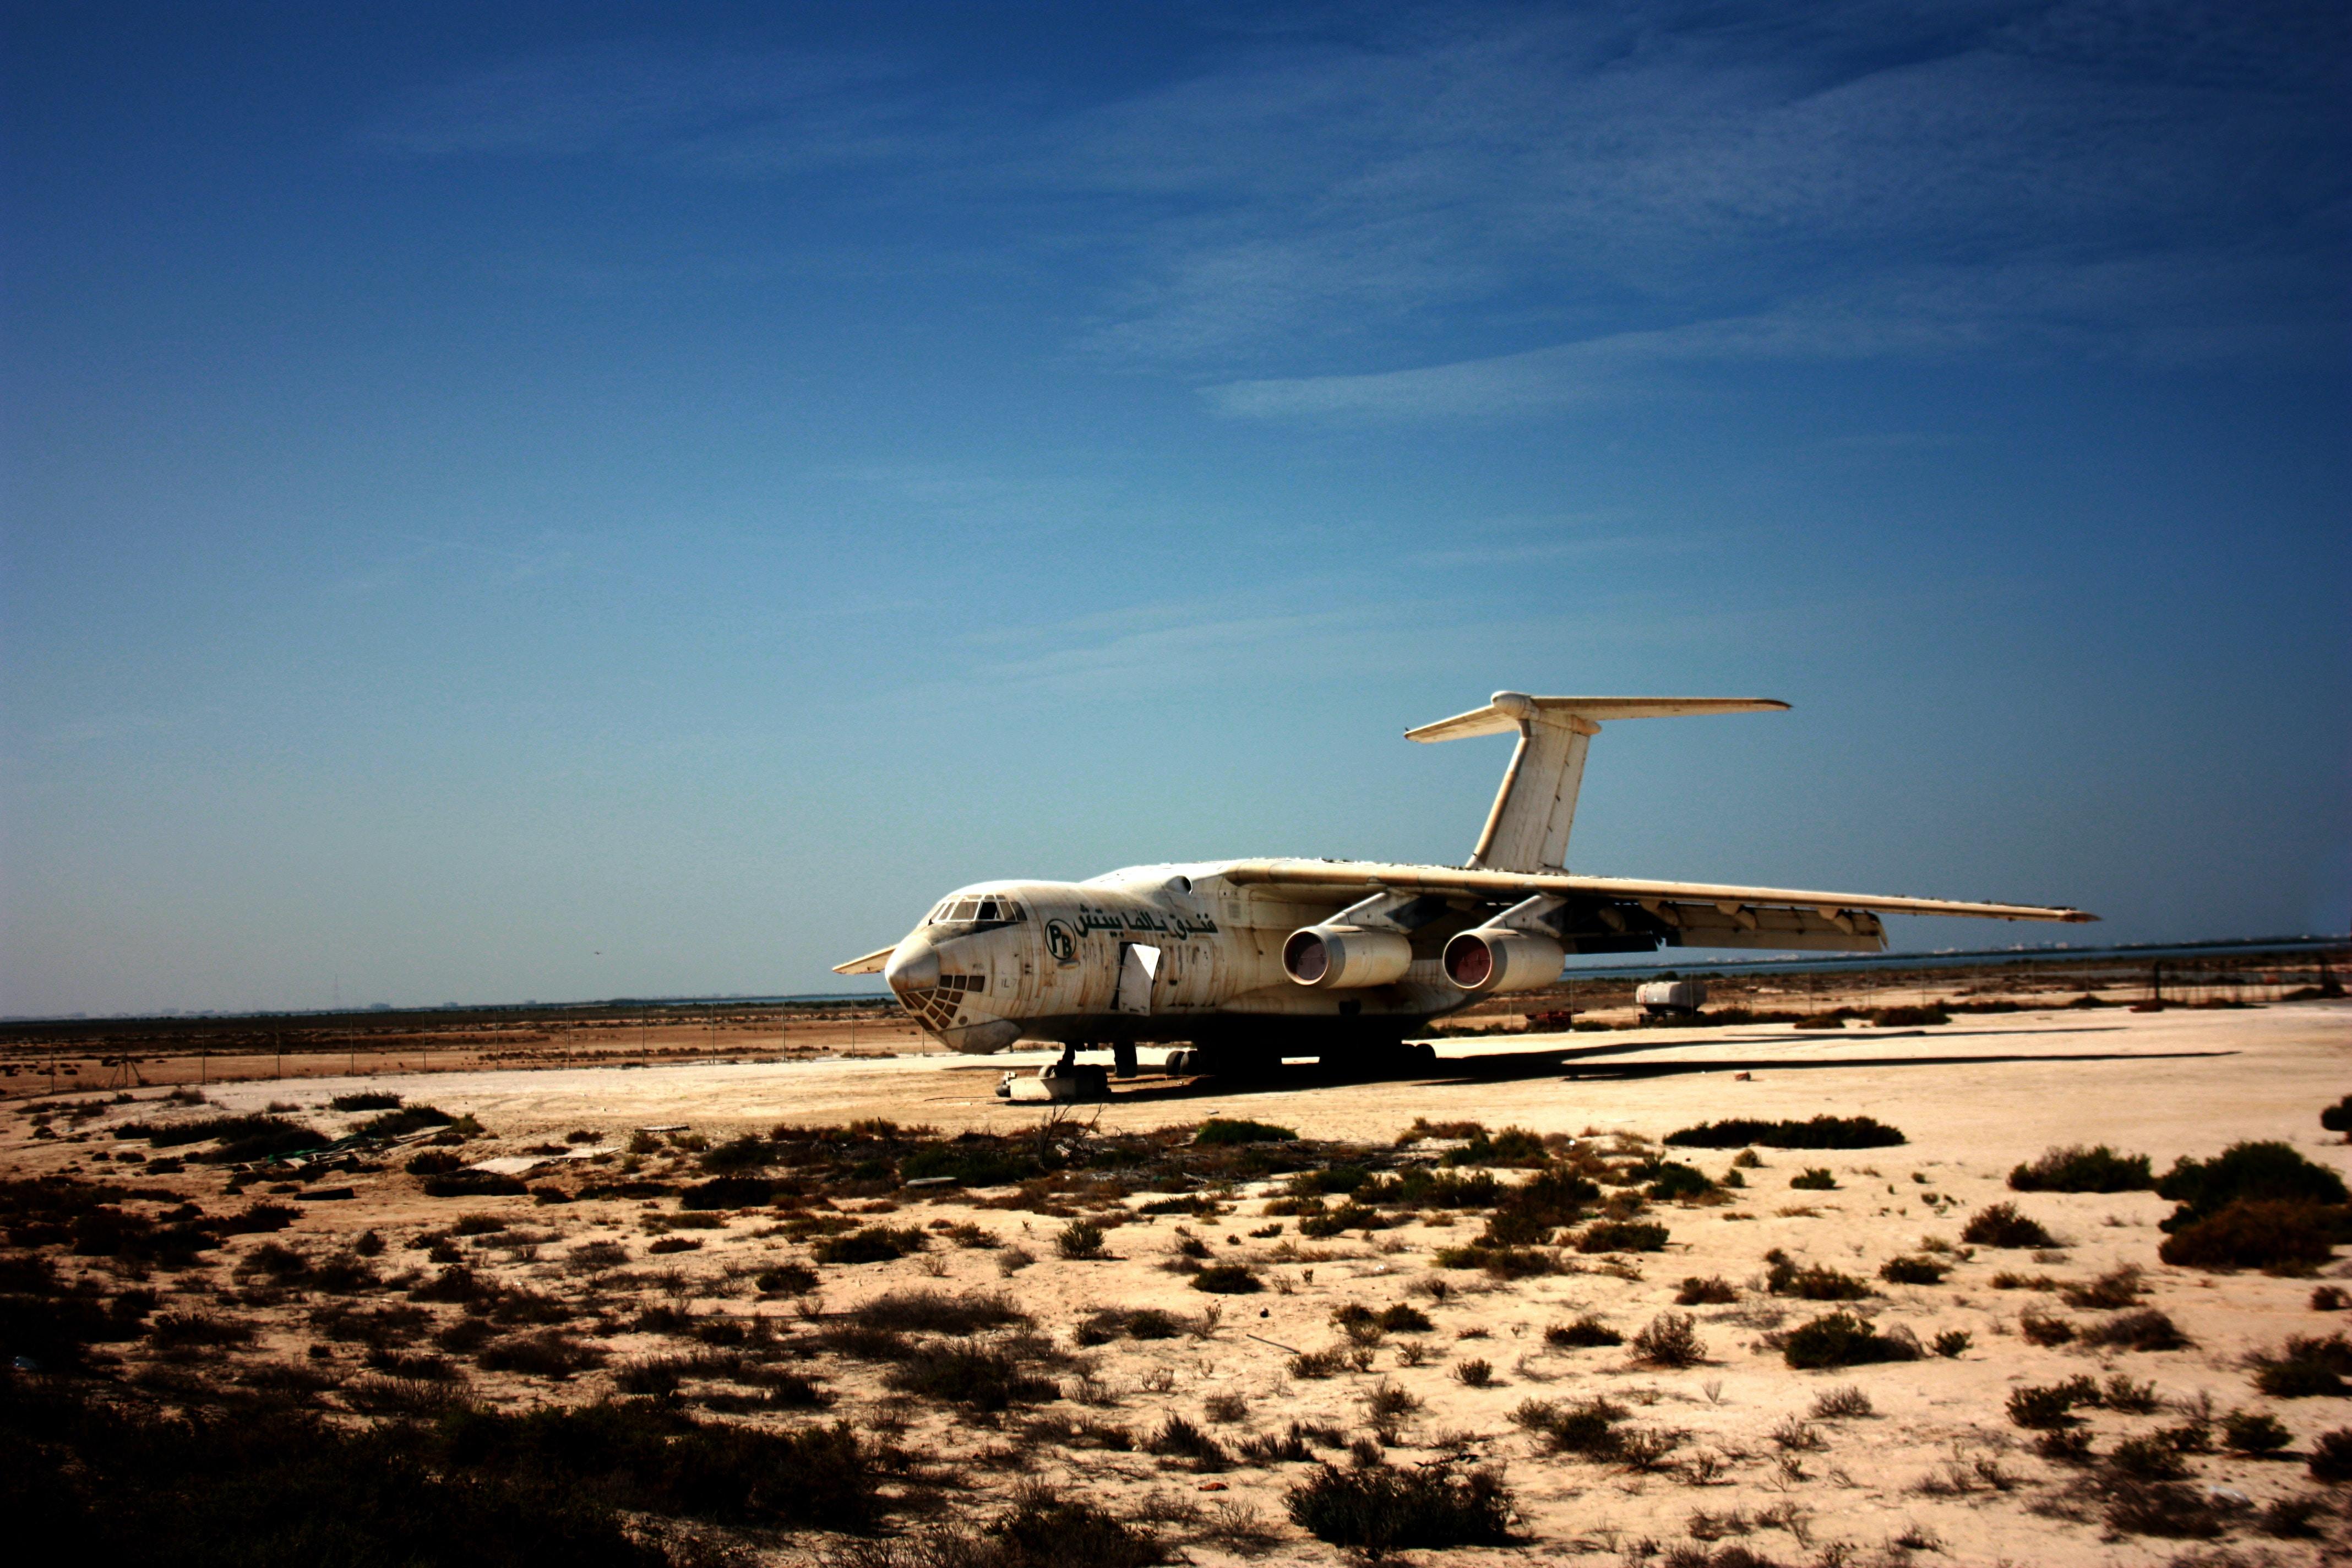 white airliner under blue sky during daytime